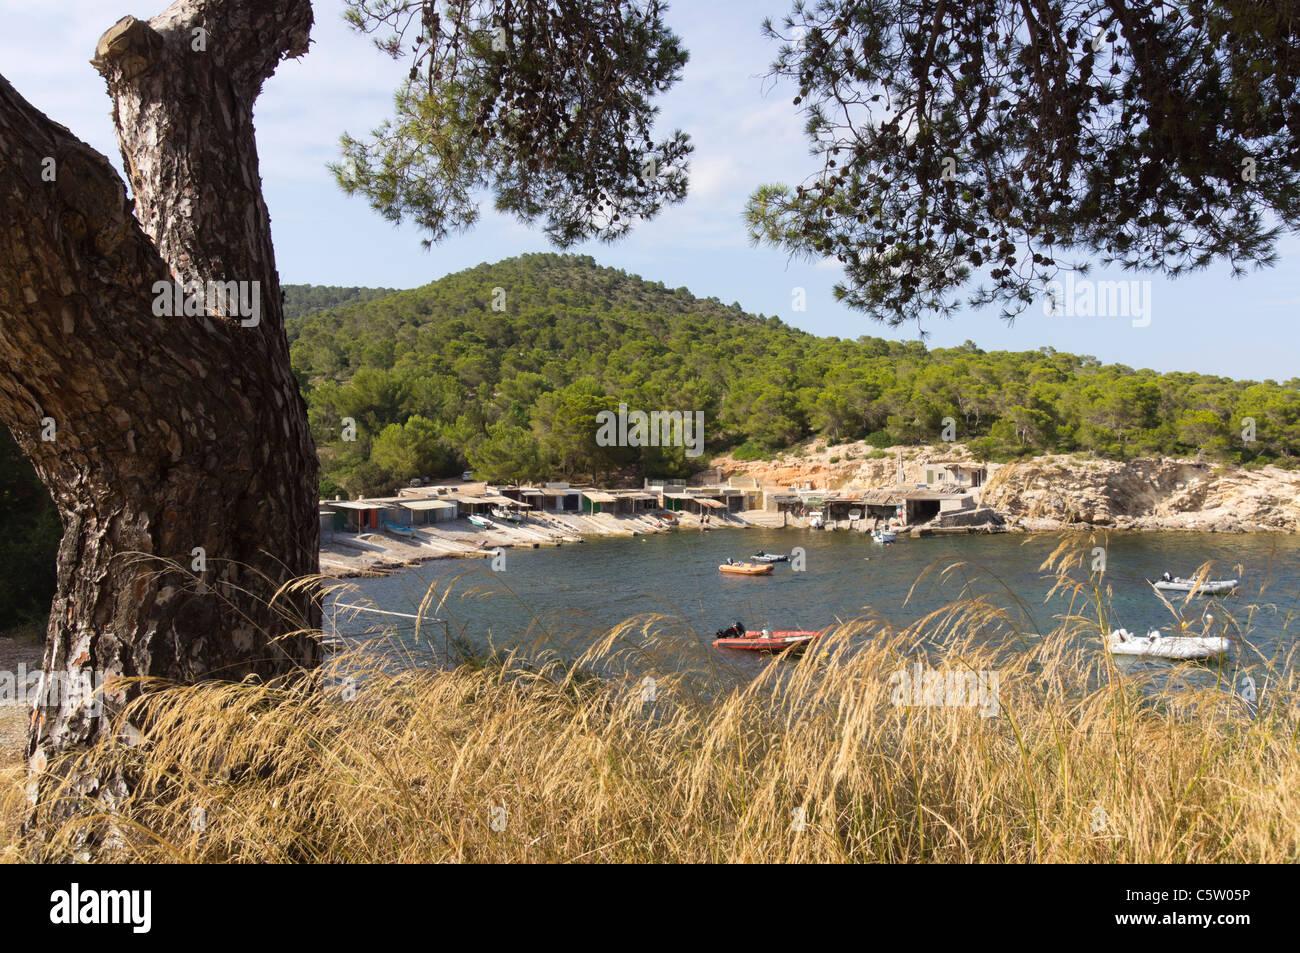 Ibiza, Balearics, Spain - Sa Caleta bay and beach - Stock Image